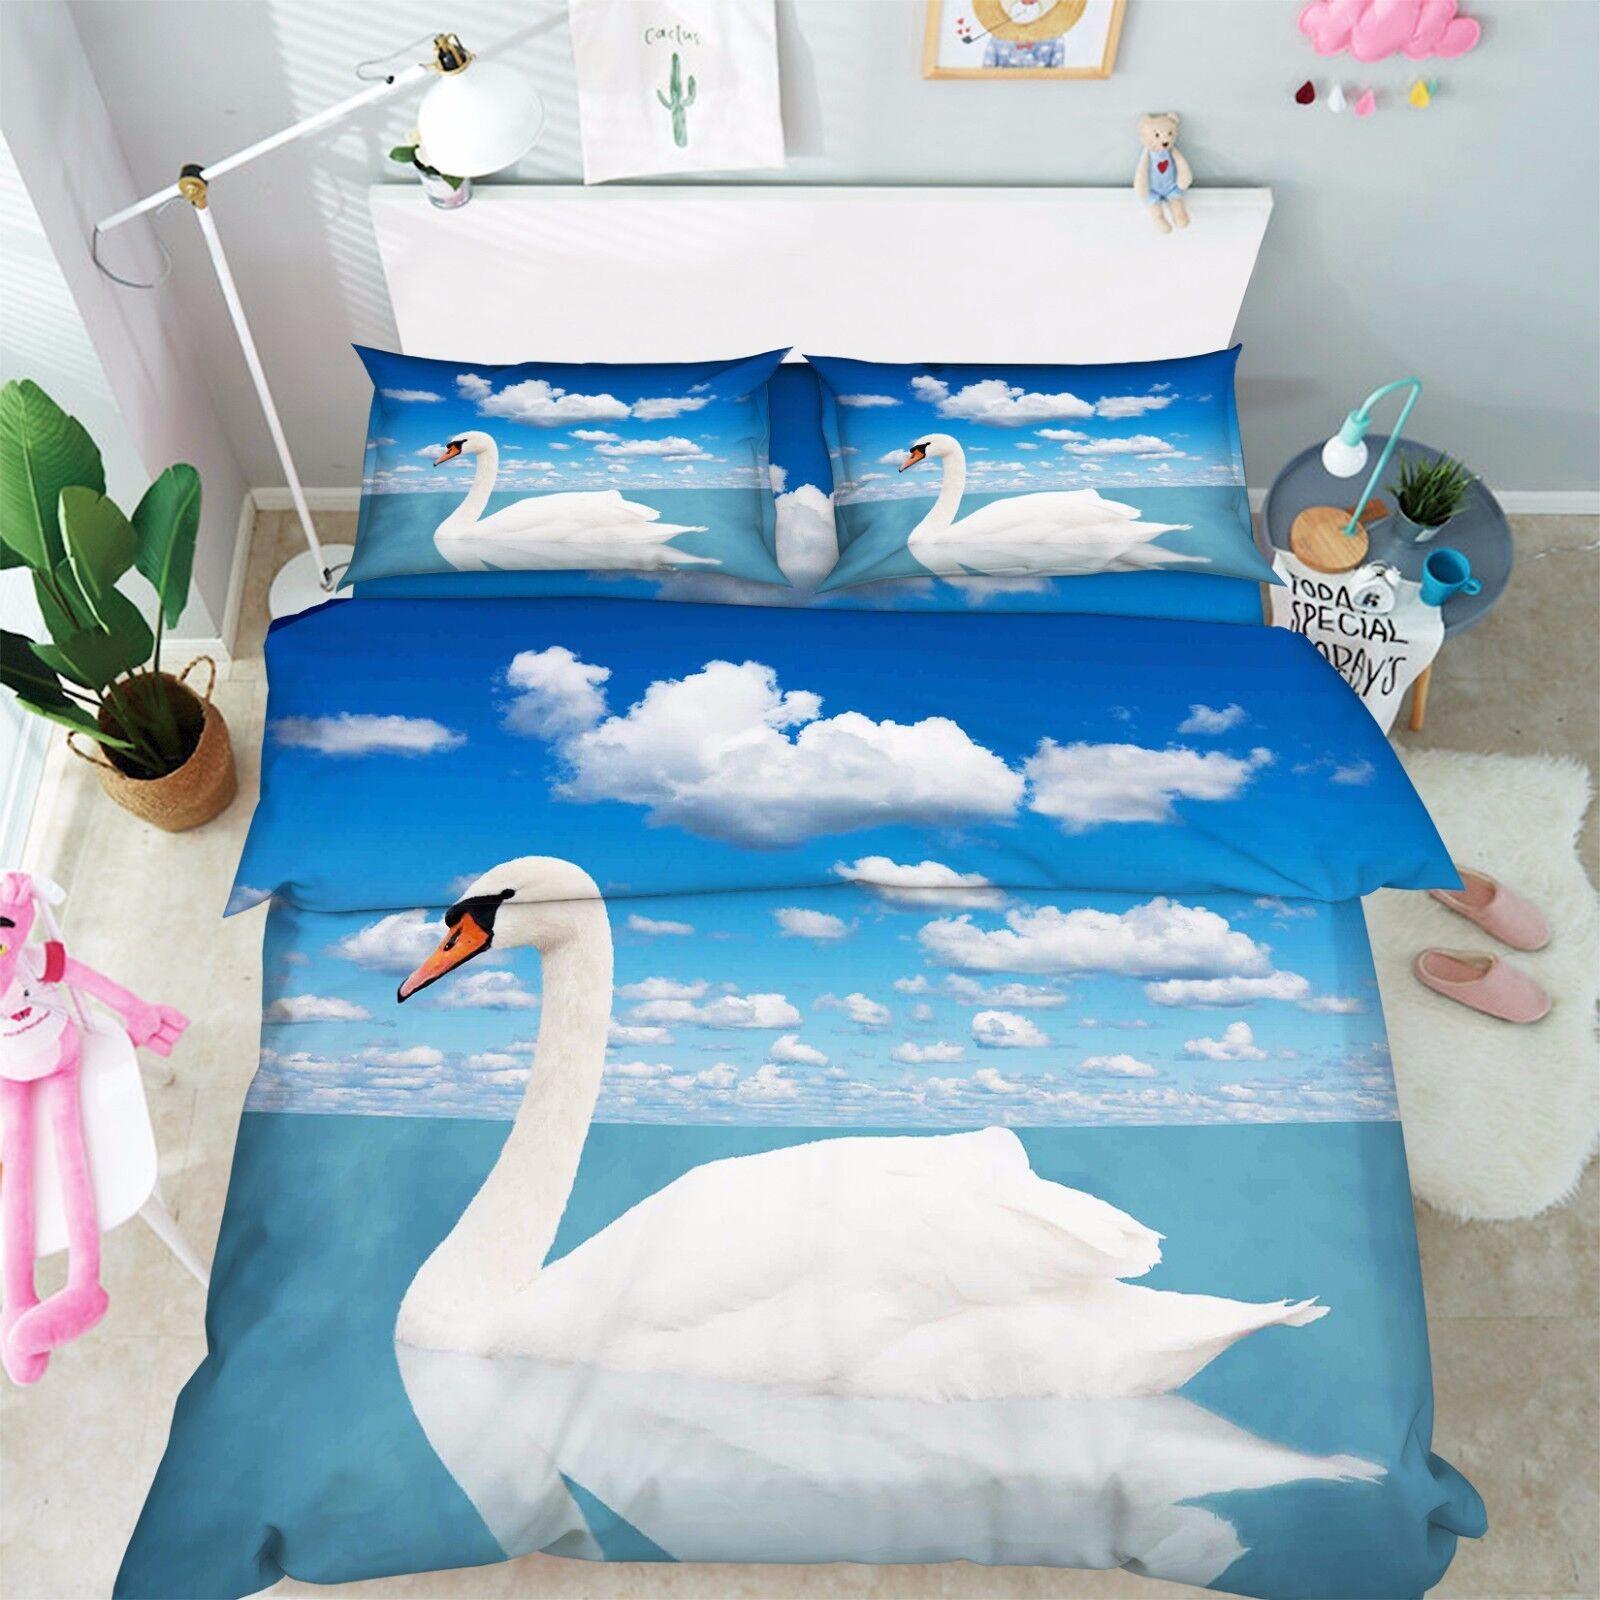 3D Weiß Swan 26 Bett Pillowcases Quilt Duvet Startseite Set Single Königin König Größe AU